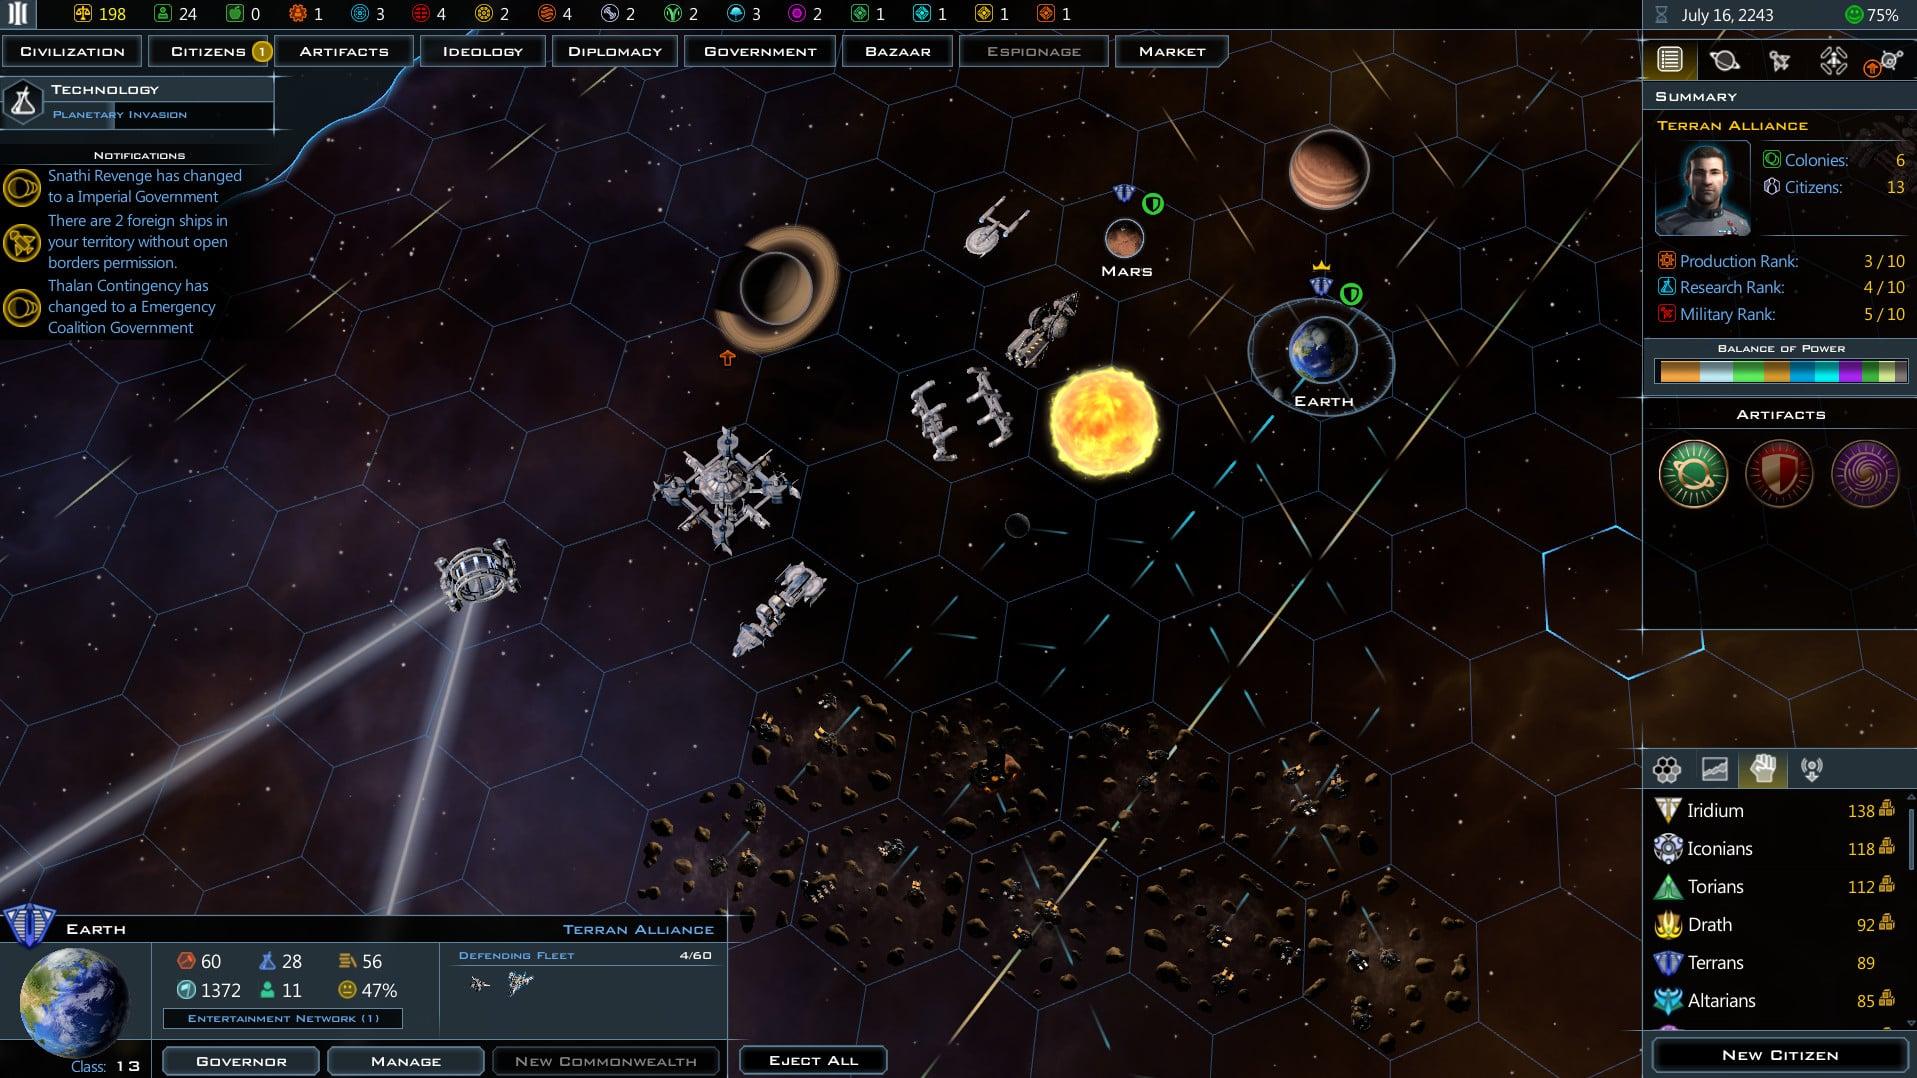 Le prochain jeu gratuit de l'Epic Games Store : Galactic Civilizations III